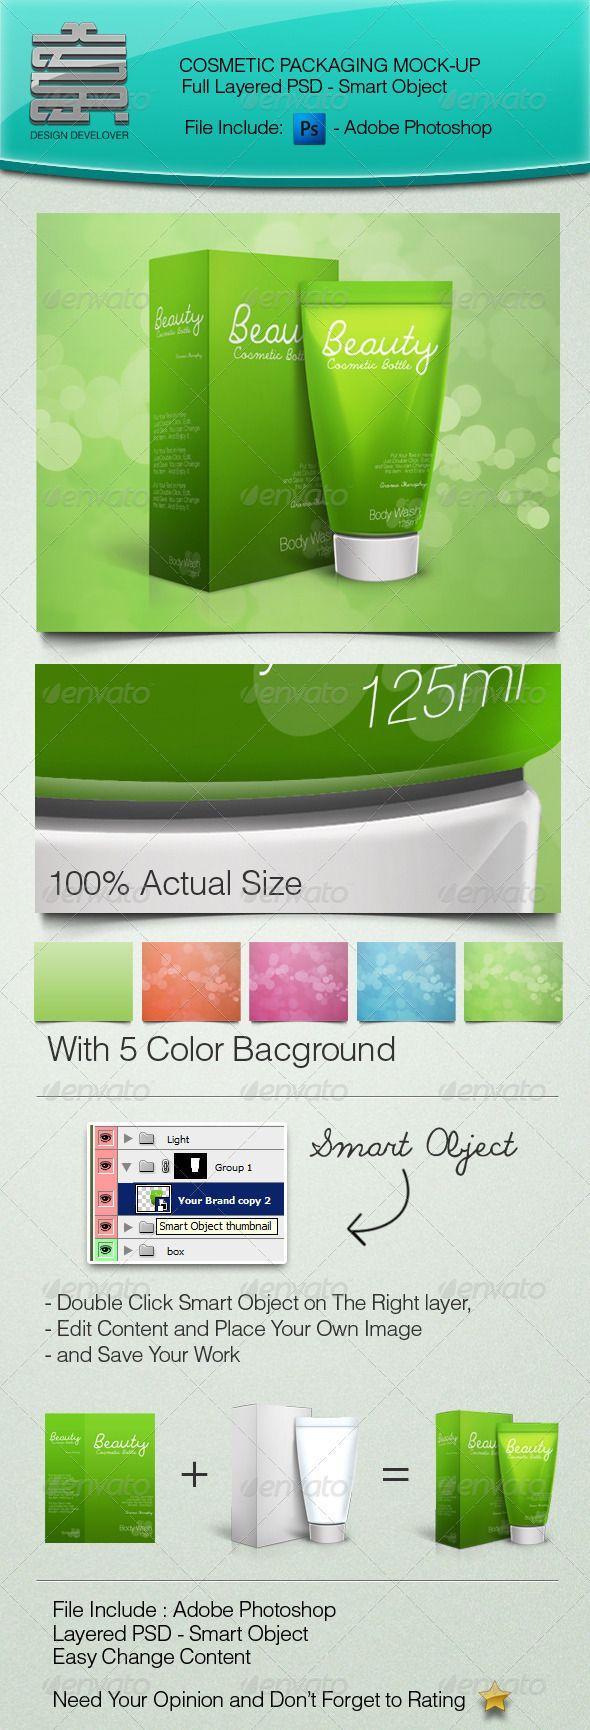 Best 119 # Packaging Templates Designs images on Pinterest   Font ...